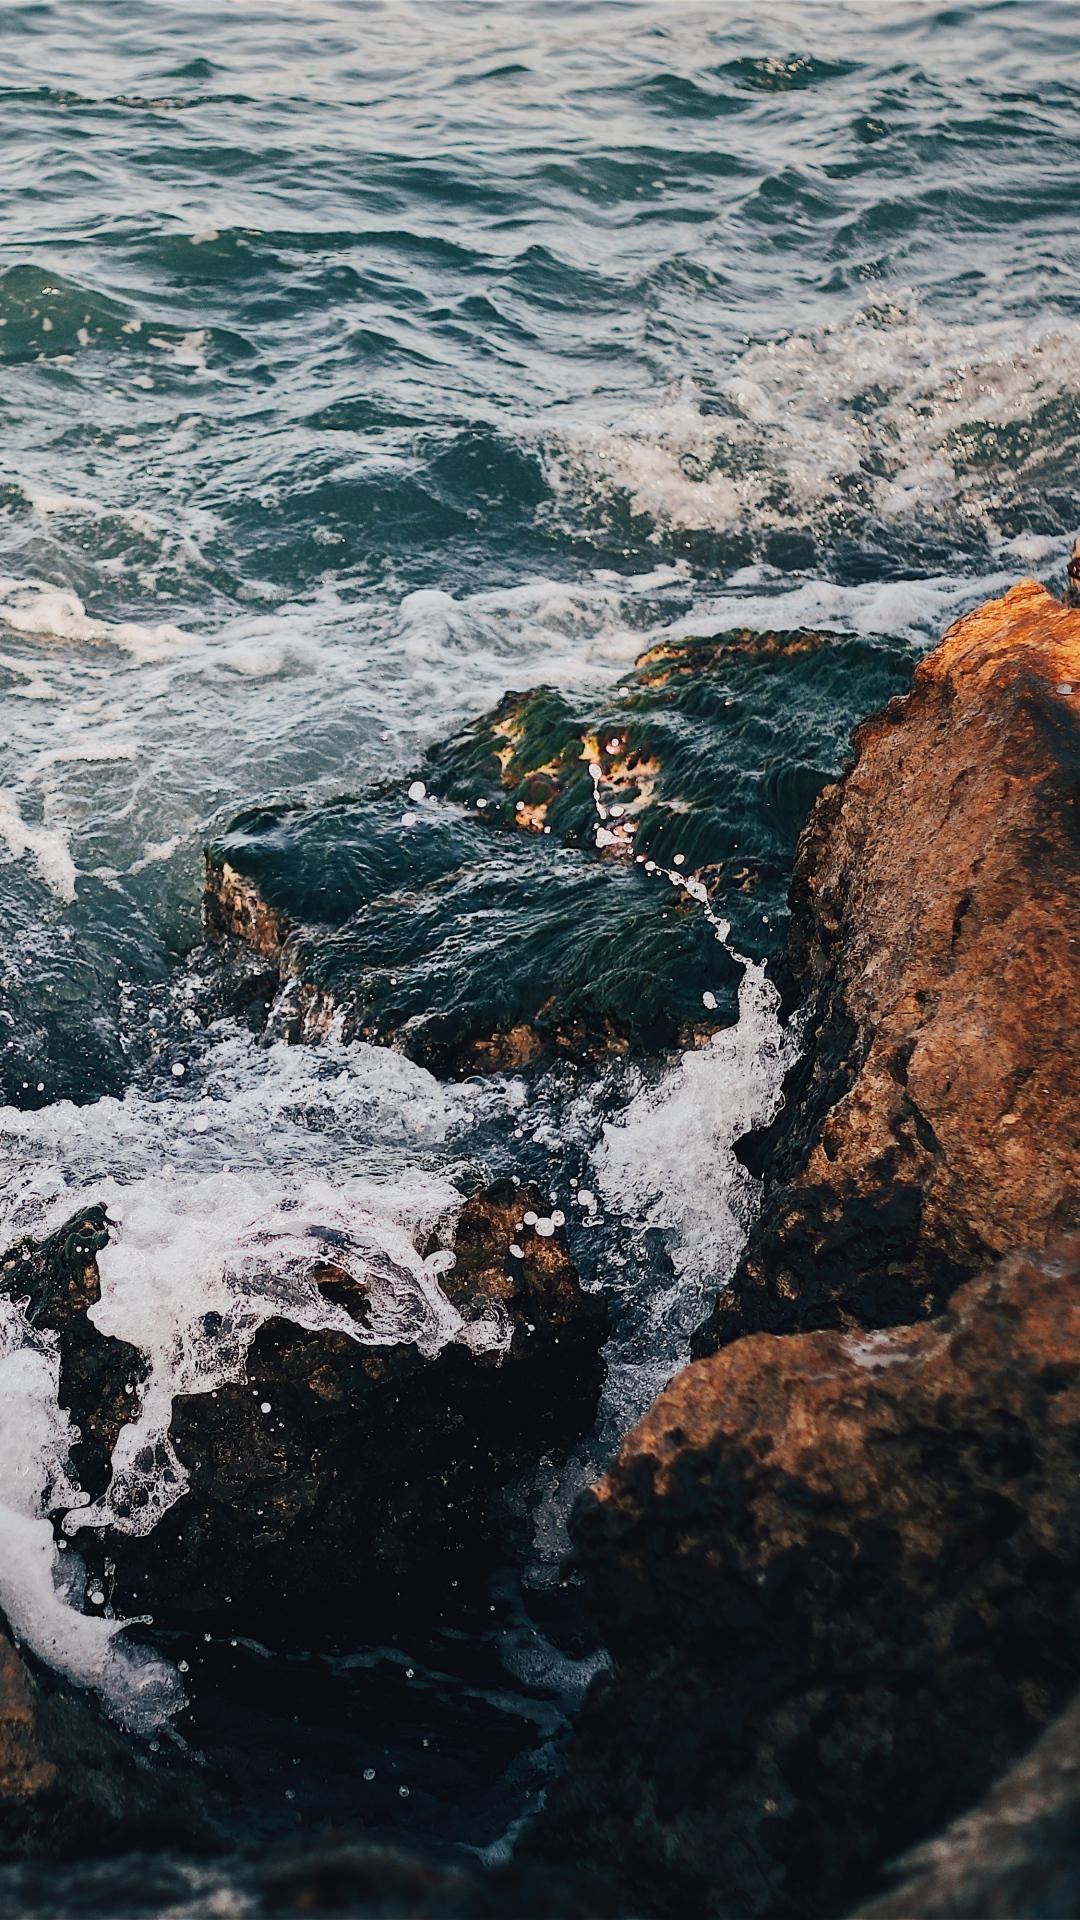 rocks sea surf 117352 1080x1920 Rocks